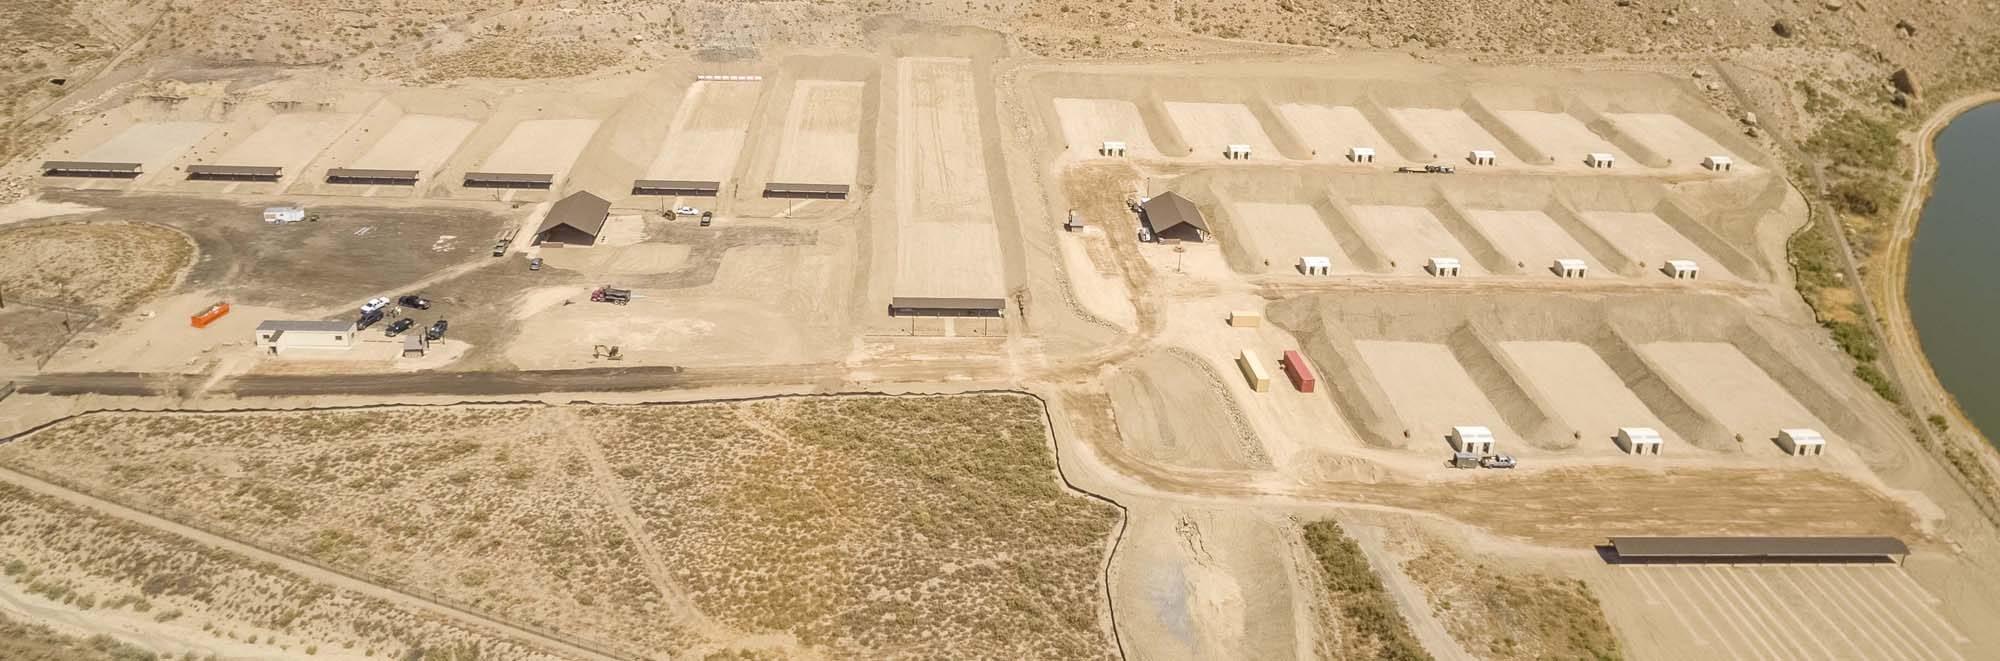 Aerial view of CSEC facilities